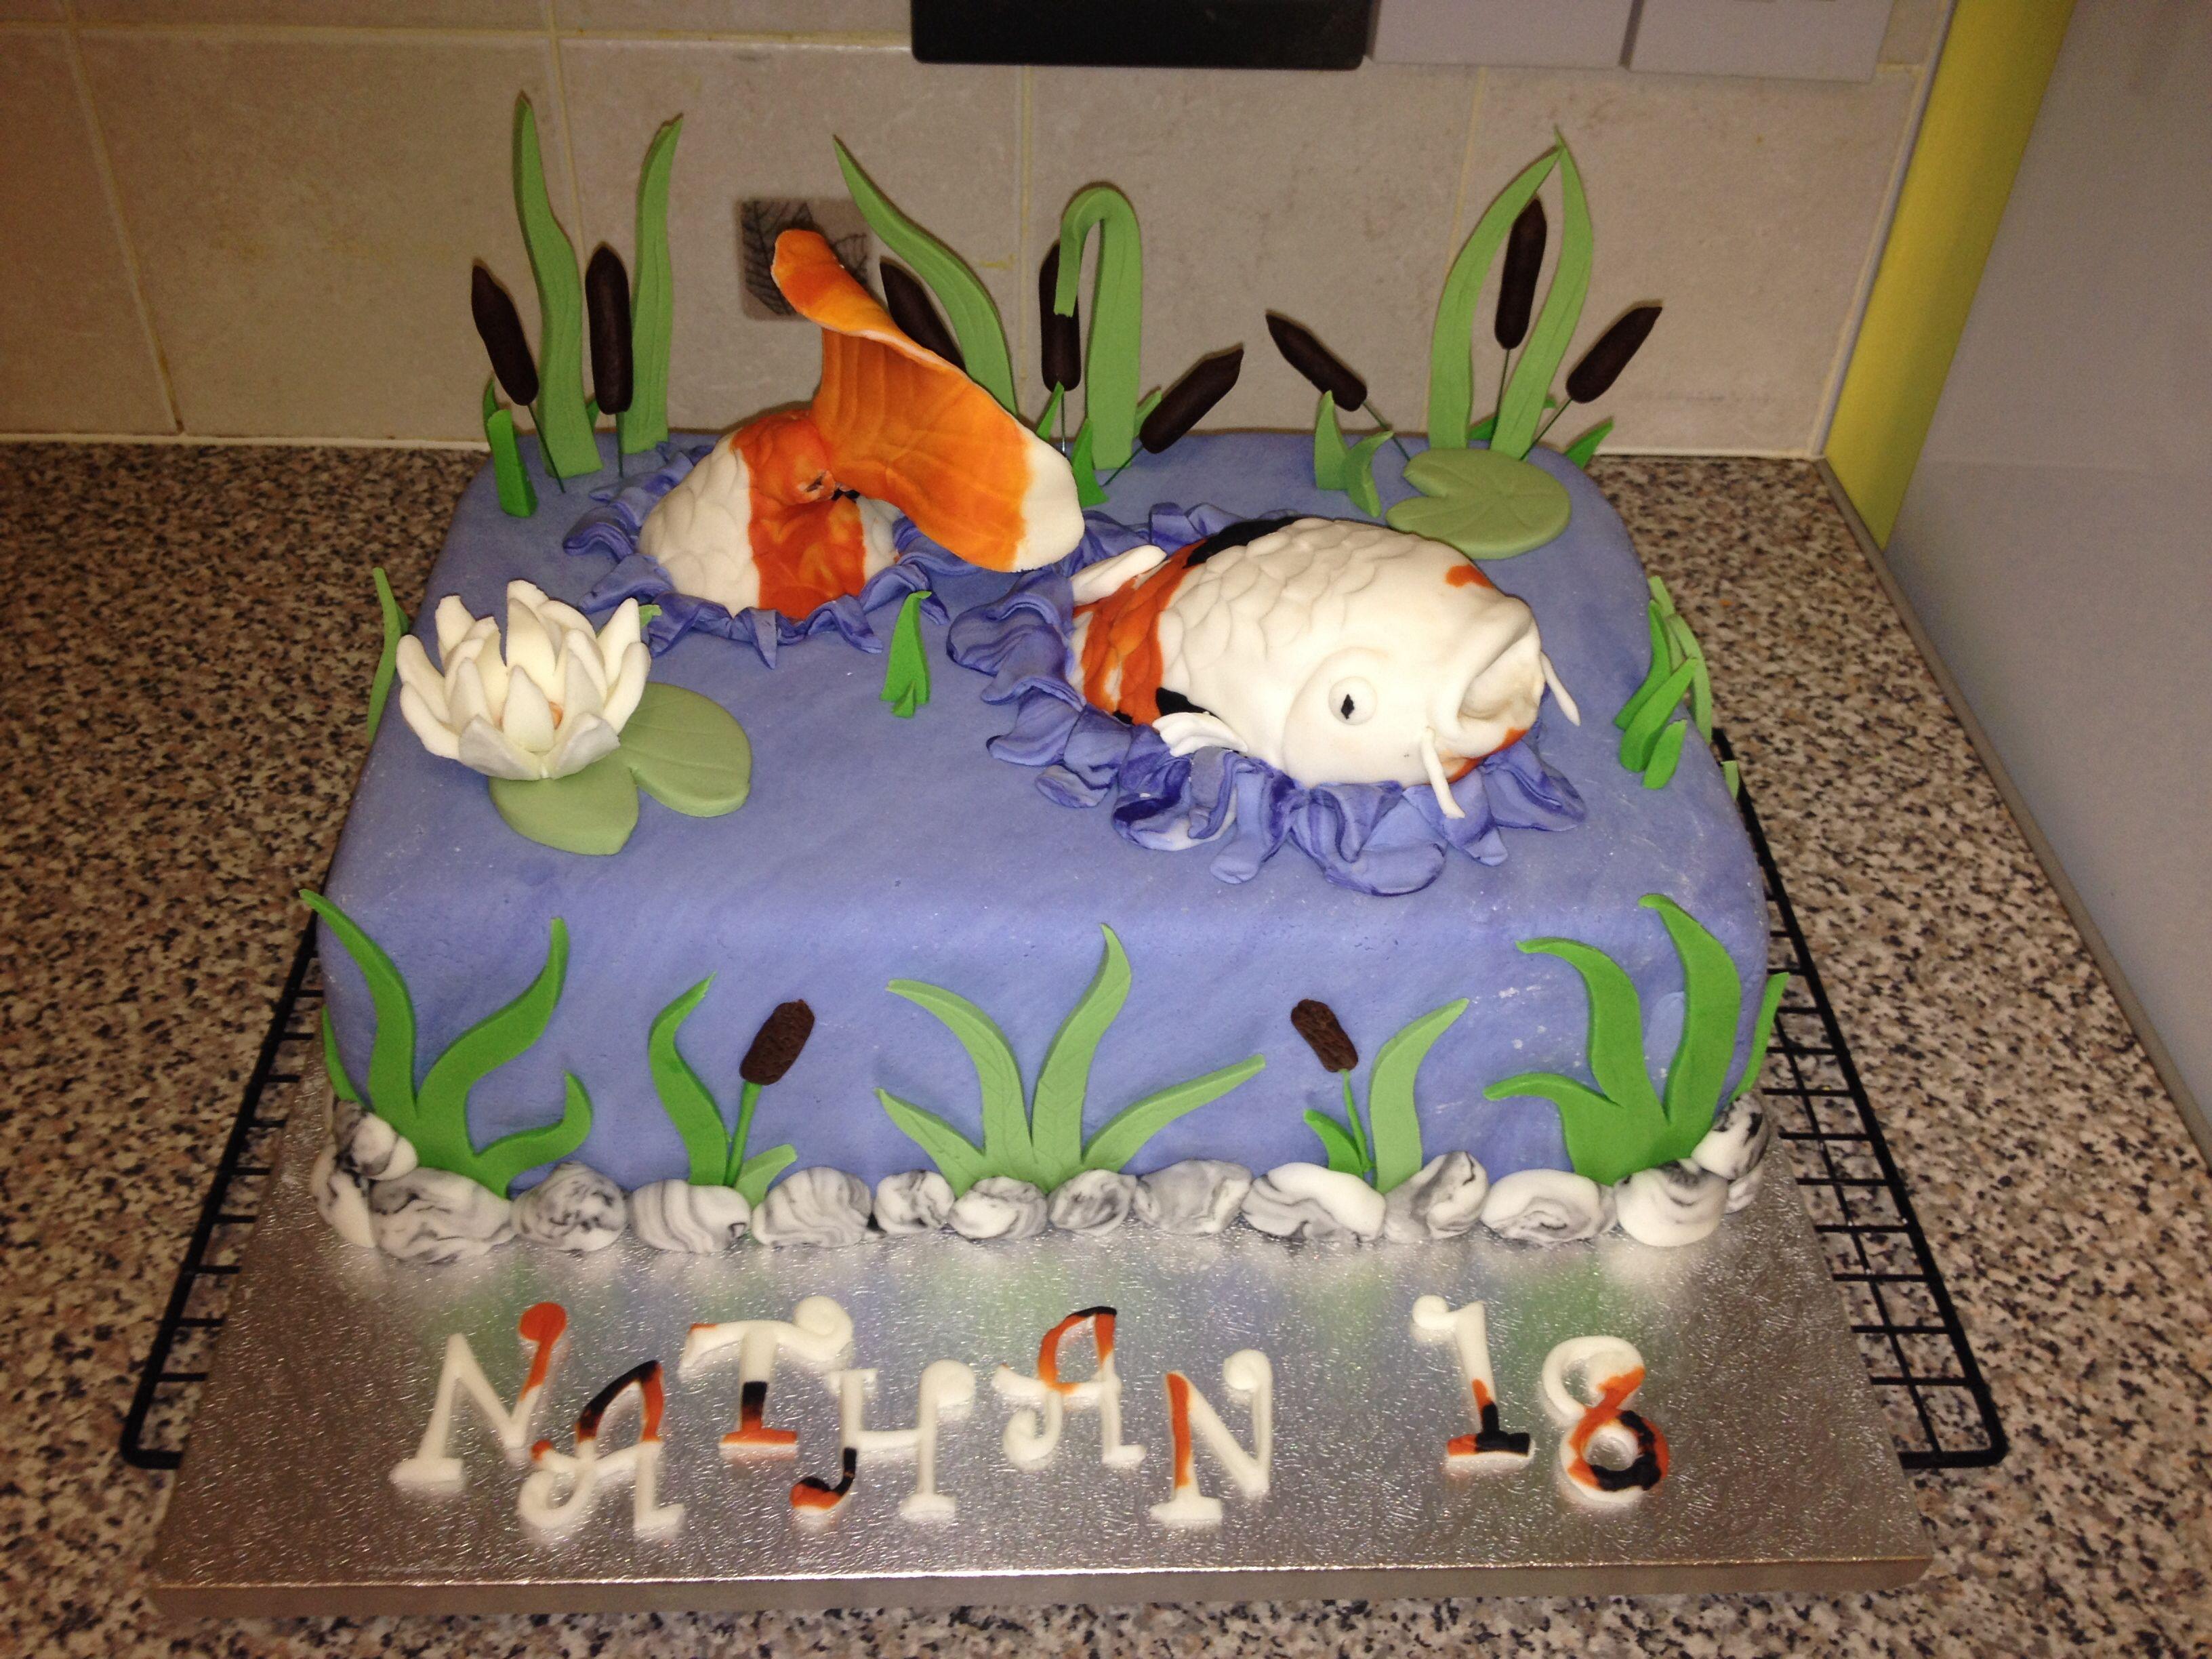 Koi Carp Cake 100 Edible Fondant Koi Carp Garden Pond Cake